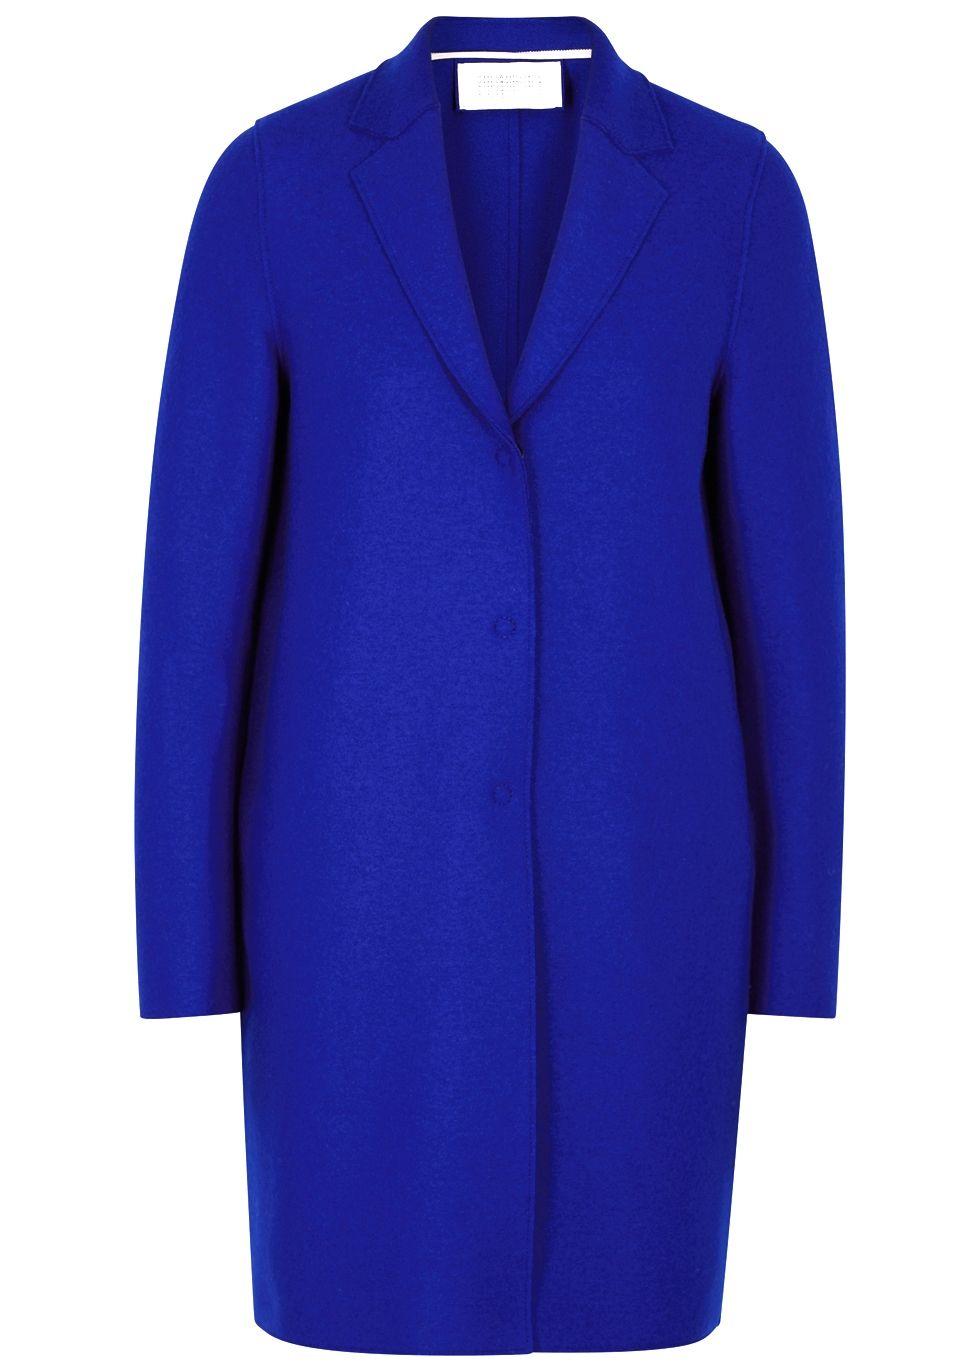 5a95a88a Cobalt Blue Wool Coat | Harris Wharf London | coats, sweaters and ...